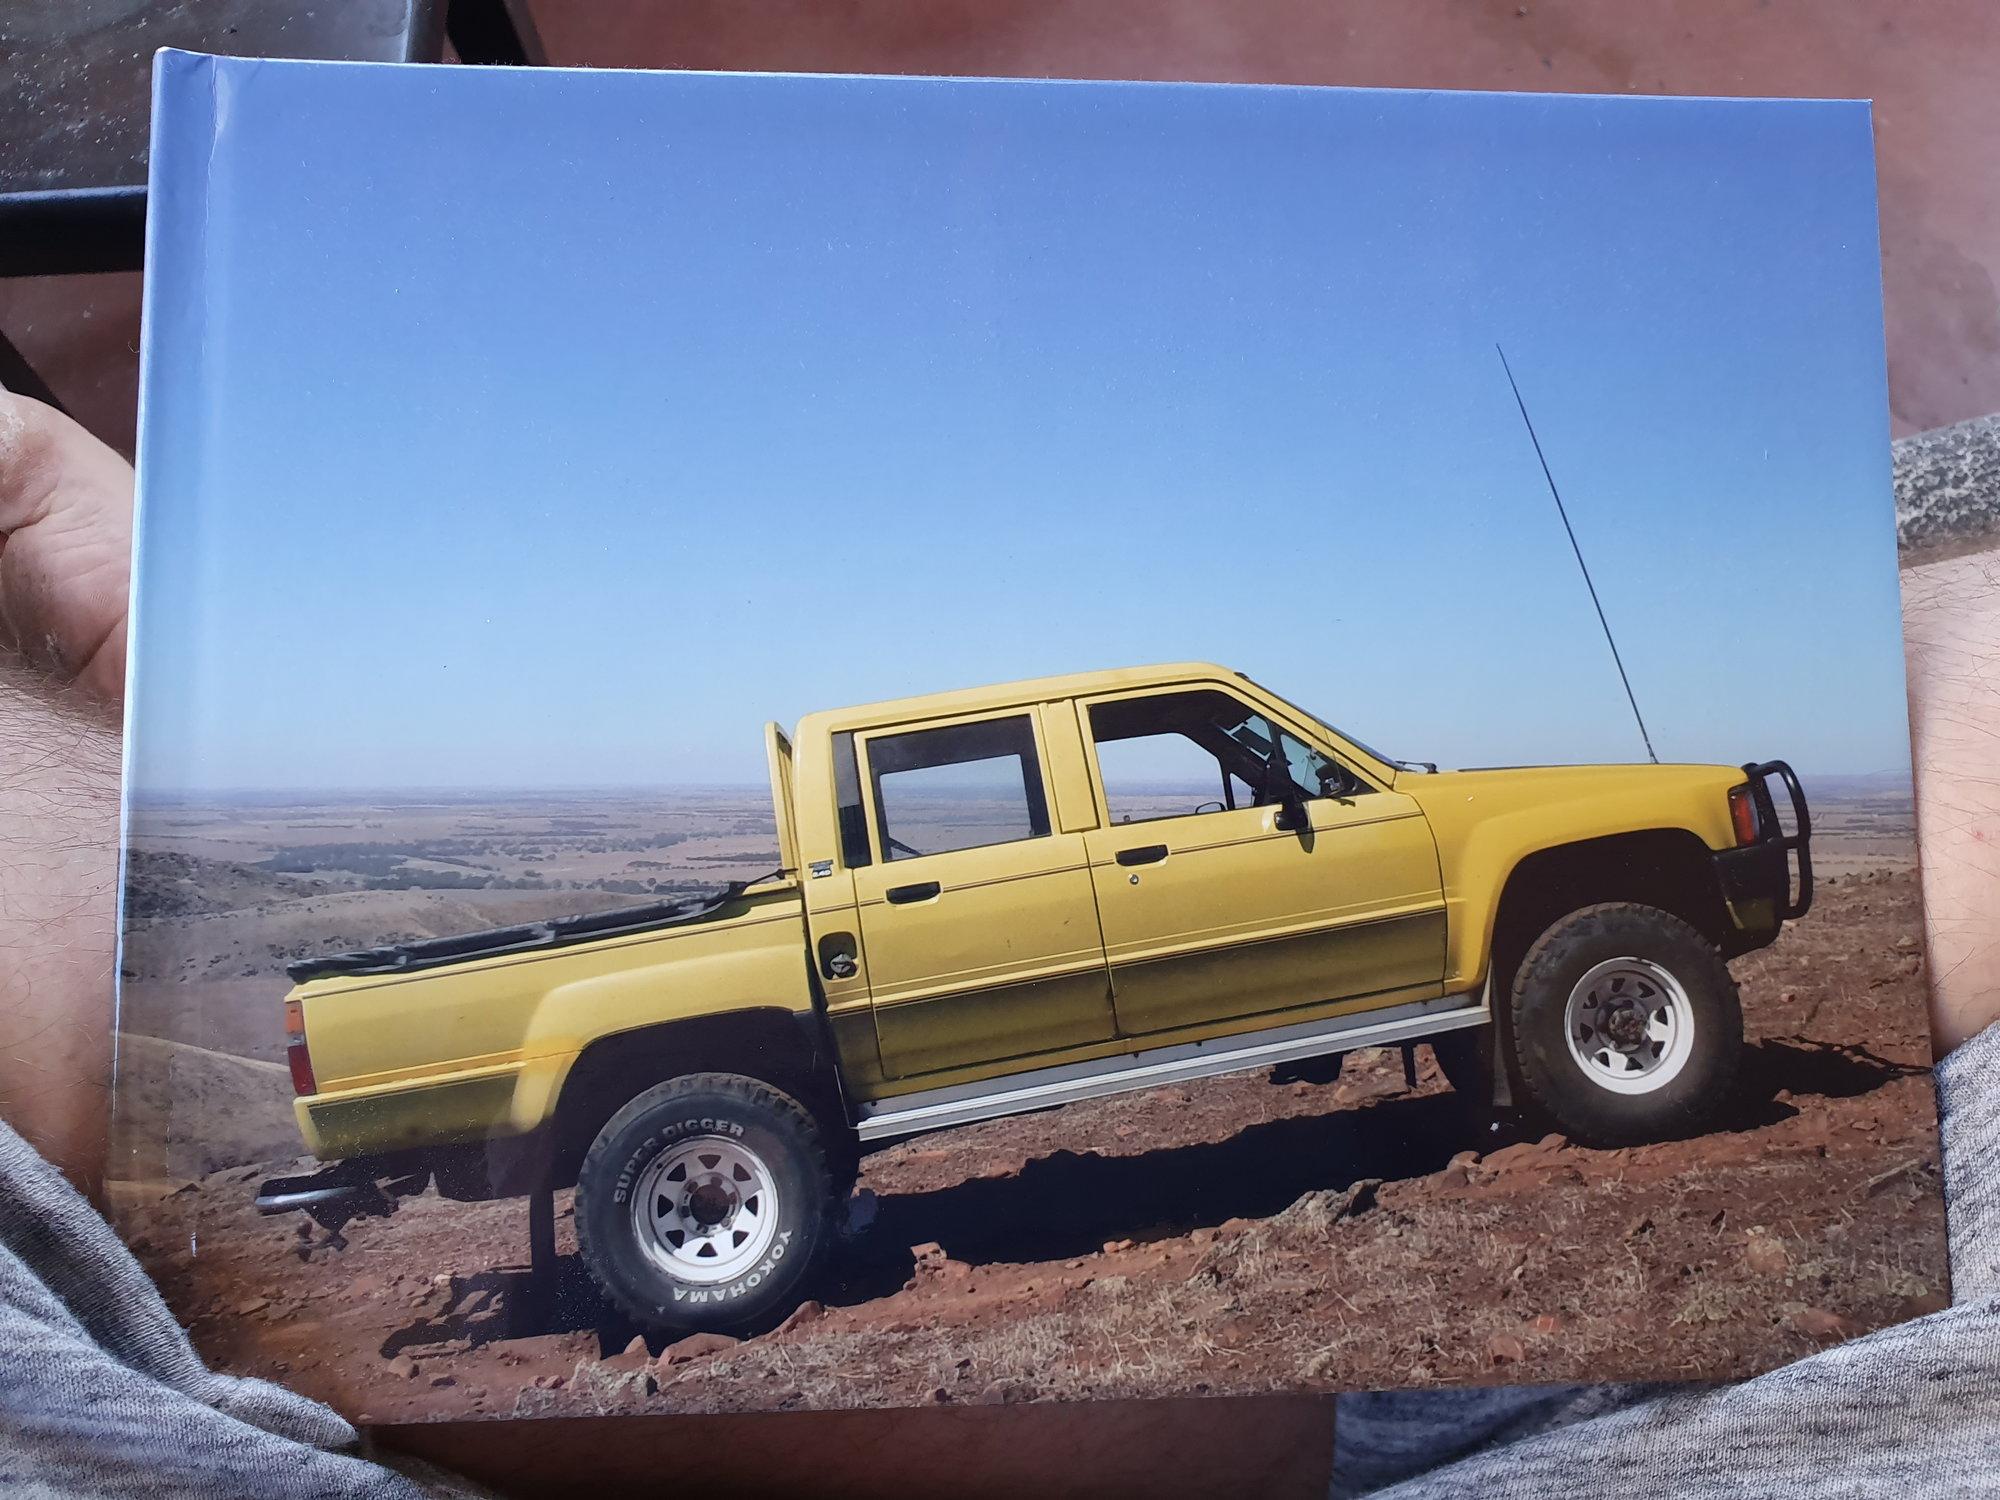 Kelebihan Toyota Hilux 1985 Murah Berkualitas